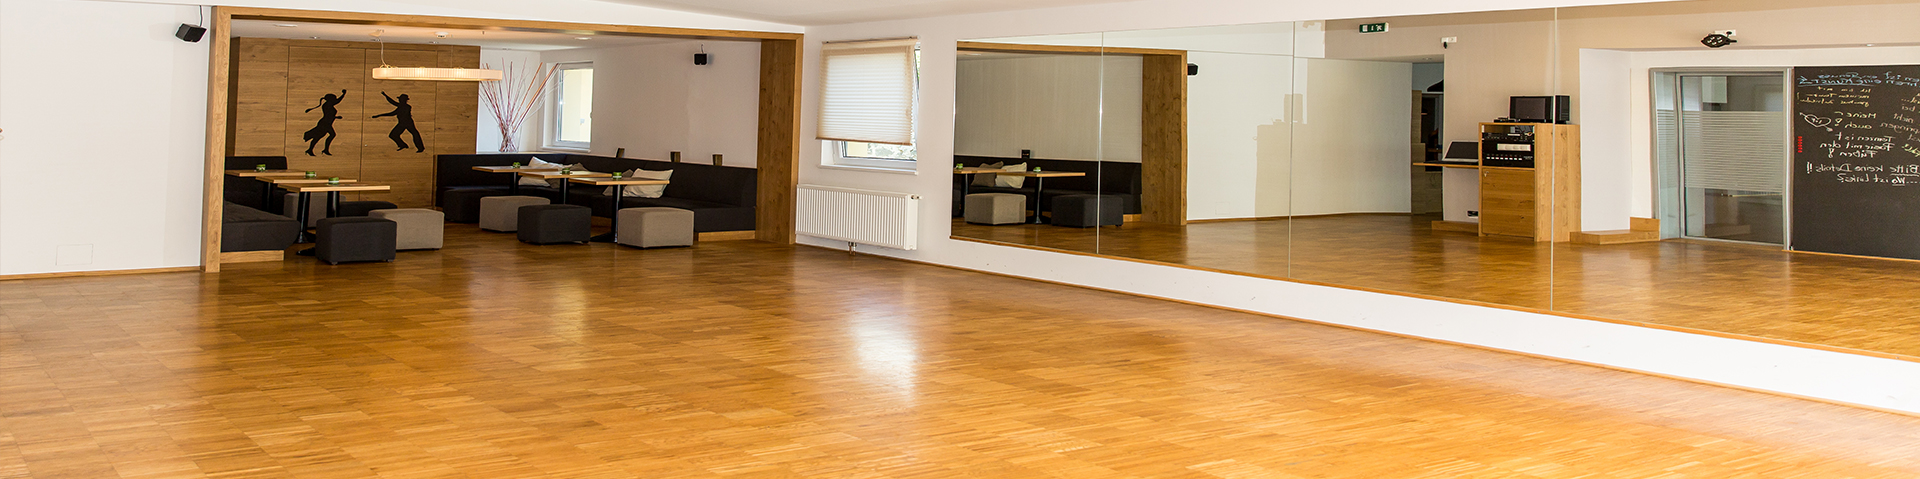 Tanzwelt Lounge